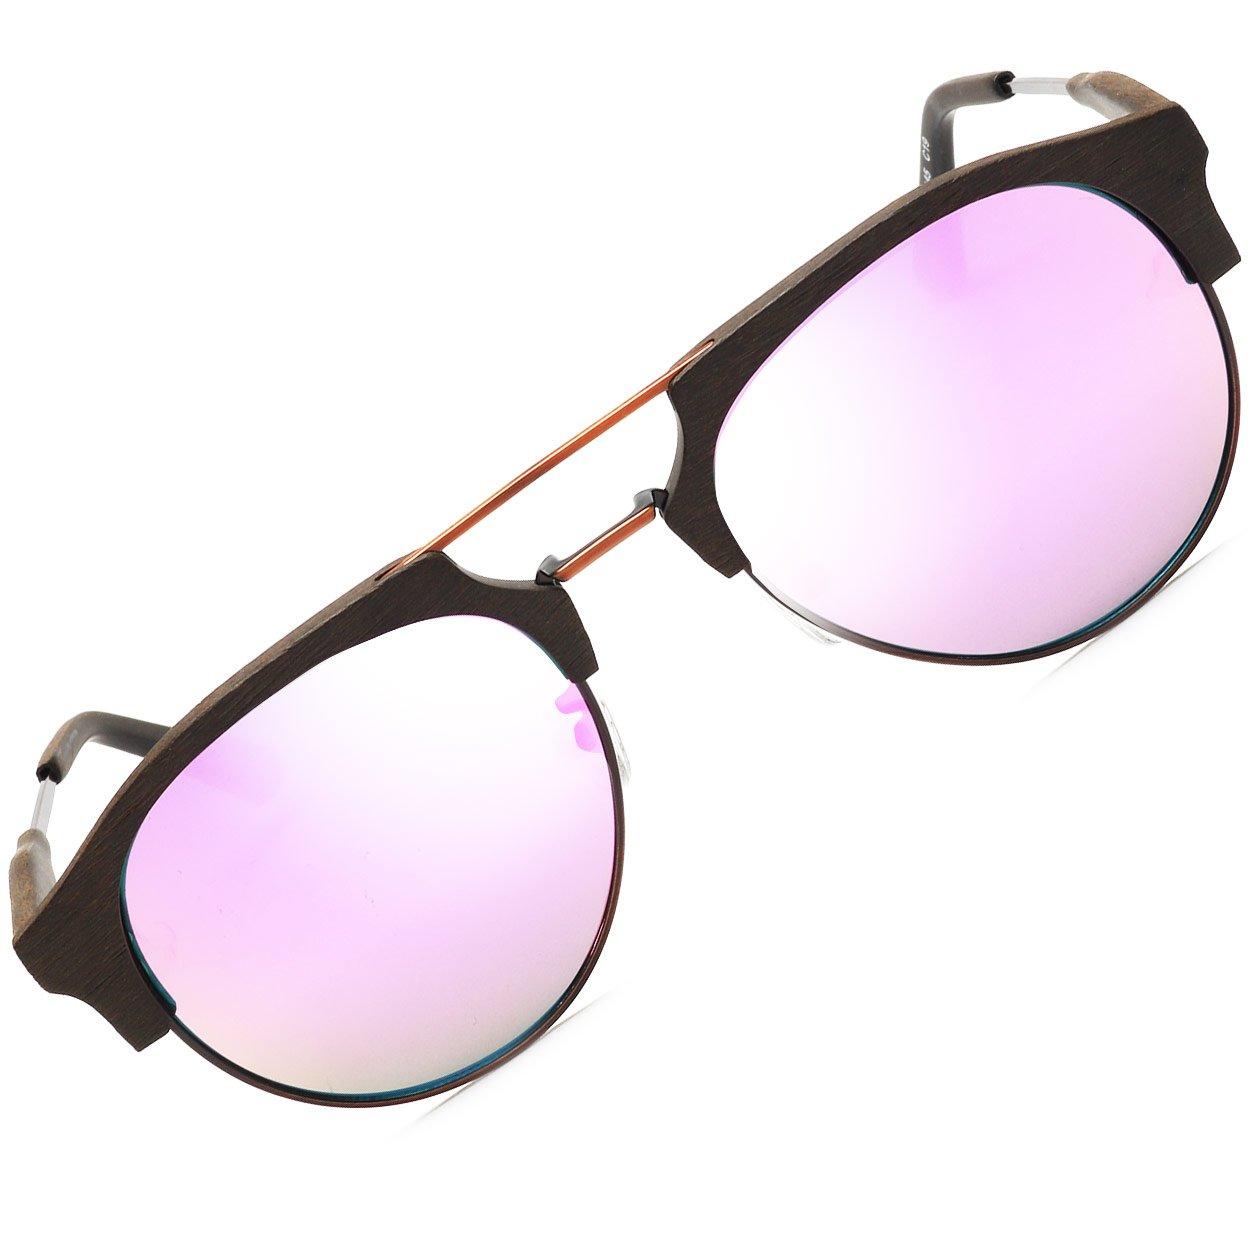 BAVIRON メンズアセテートサングラスレトロラウンド類似の木製メガネ偏光UV400 B07855L3SR C19ブラウン/パープル C19ブラウン/パープル